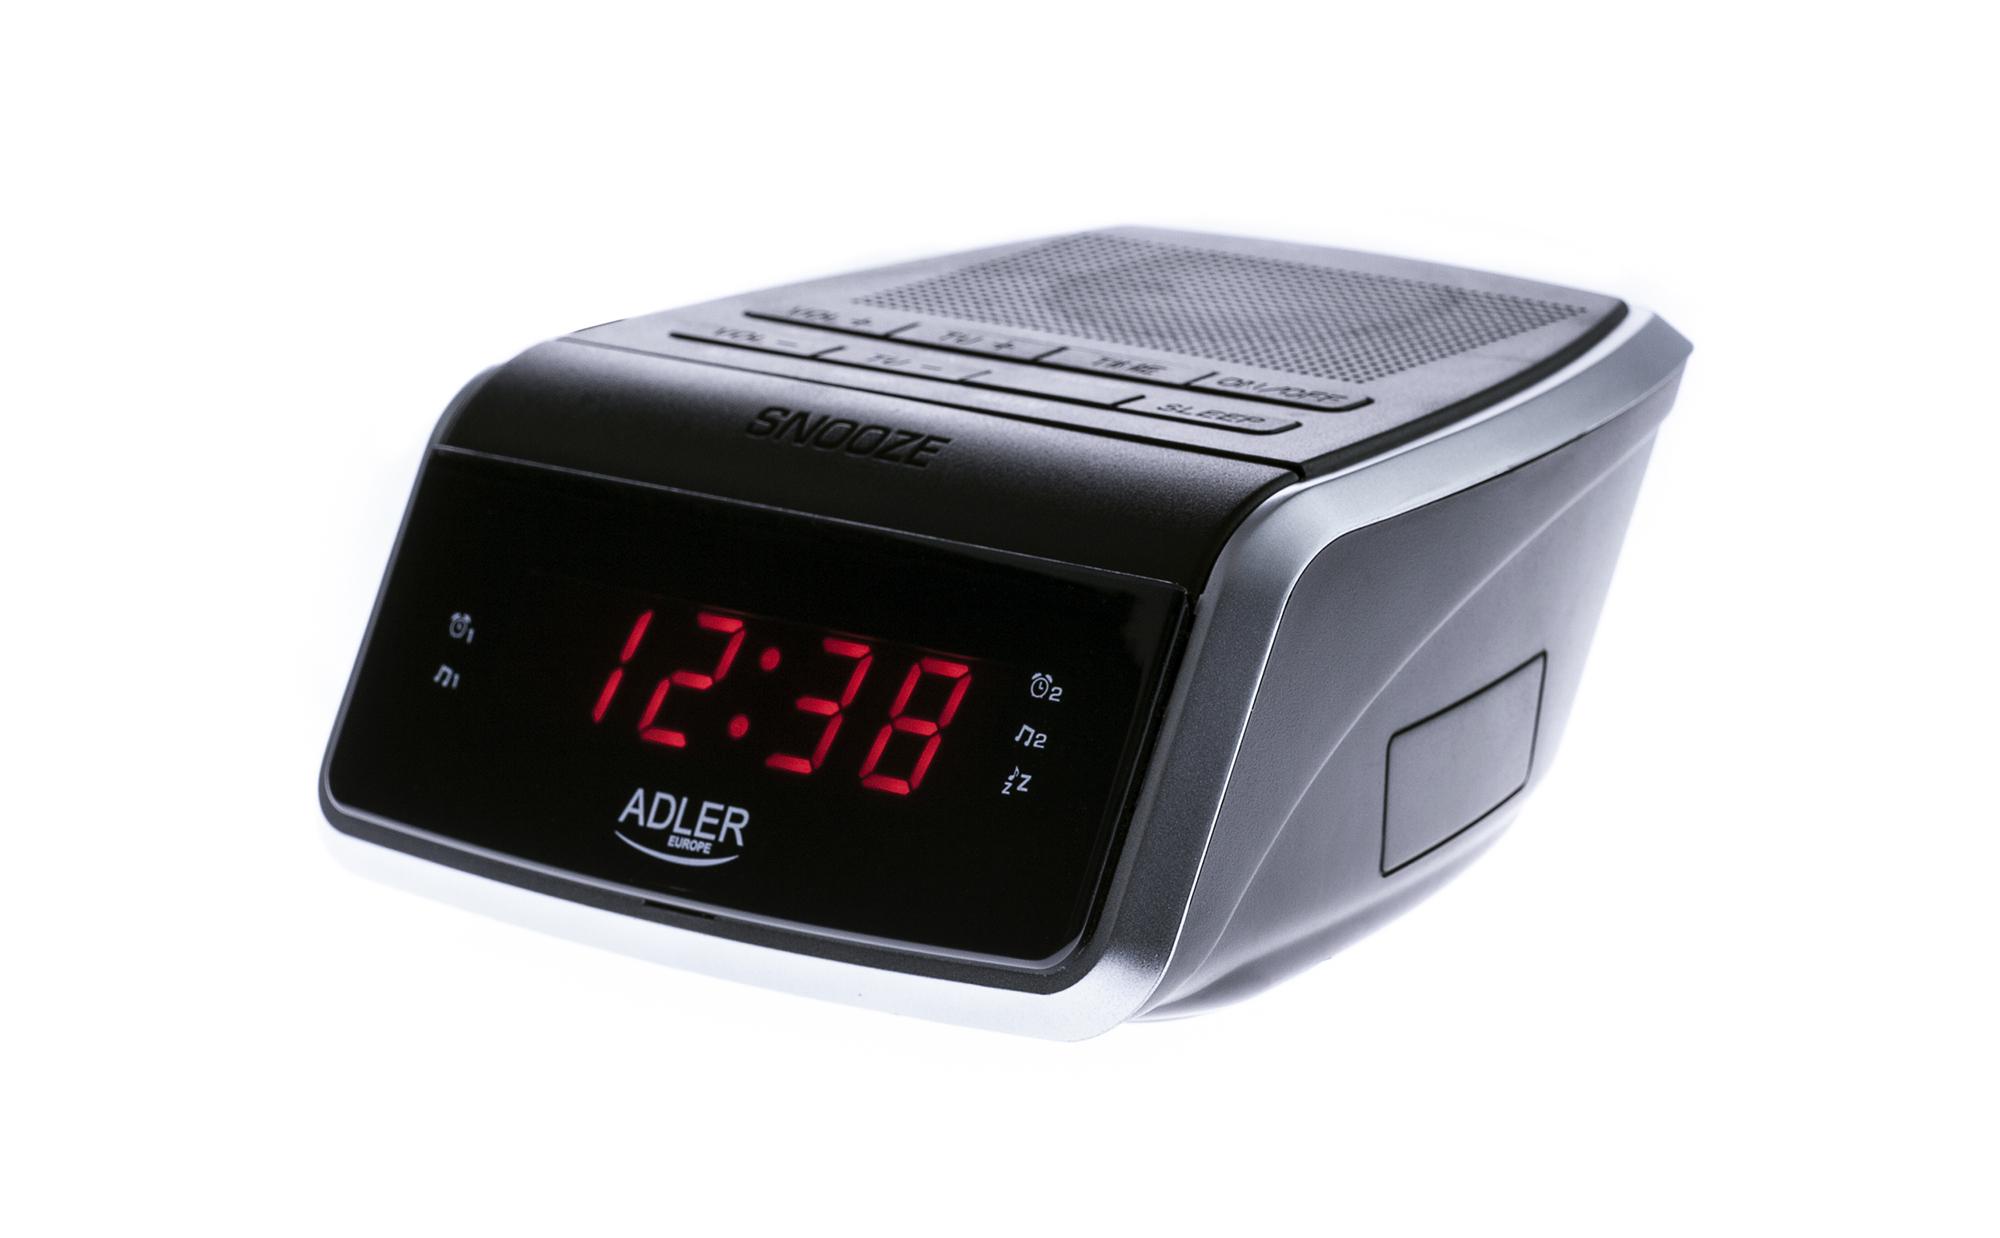 ADLER AD1157 Radiodespertador Digital AM-FM, Gran Pantalla LED, Dos Alarmas, 10 Pre sintonías, Función SNOOZE